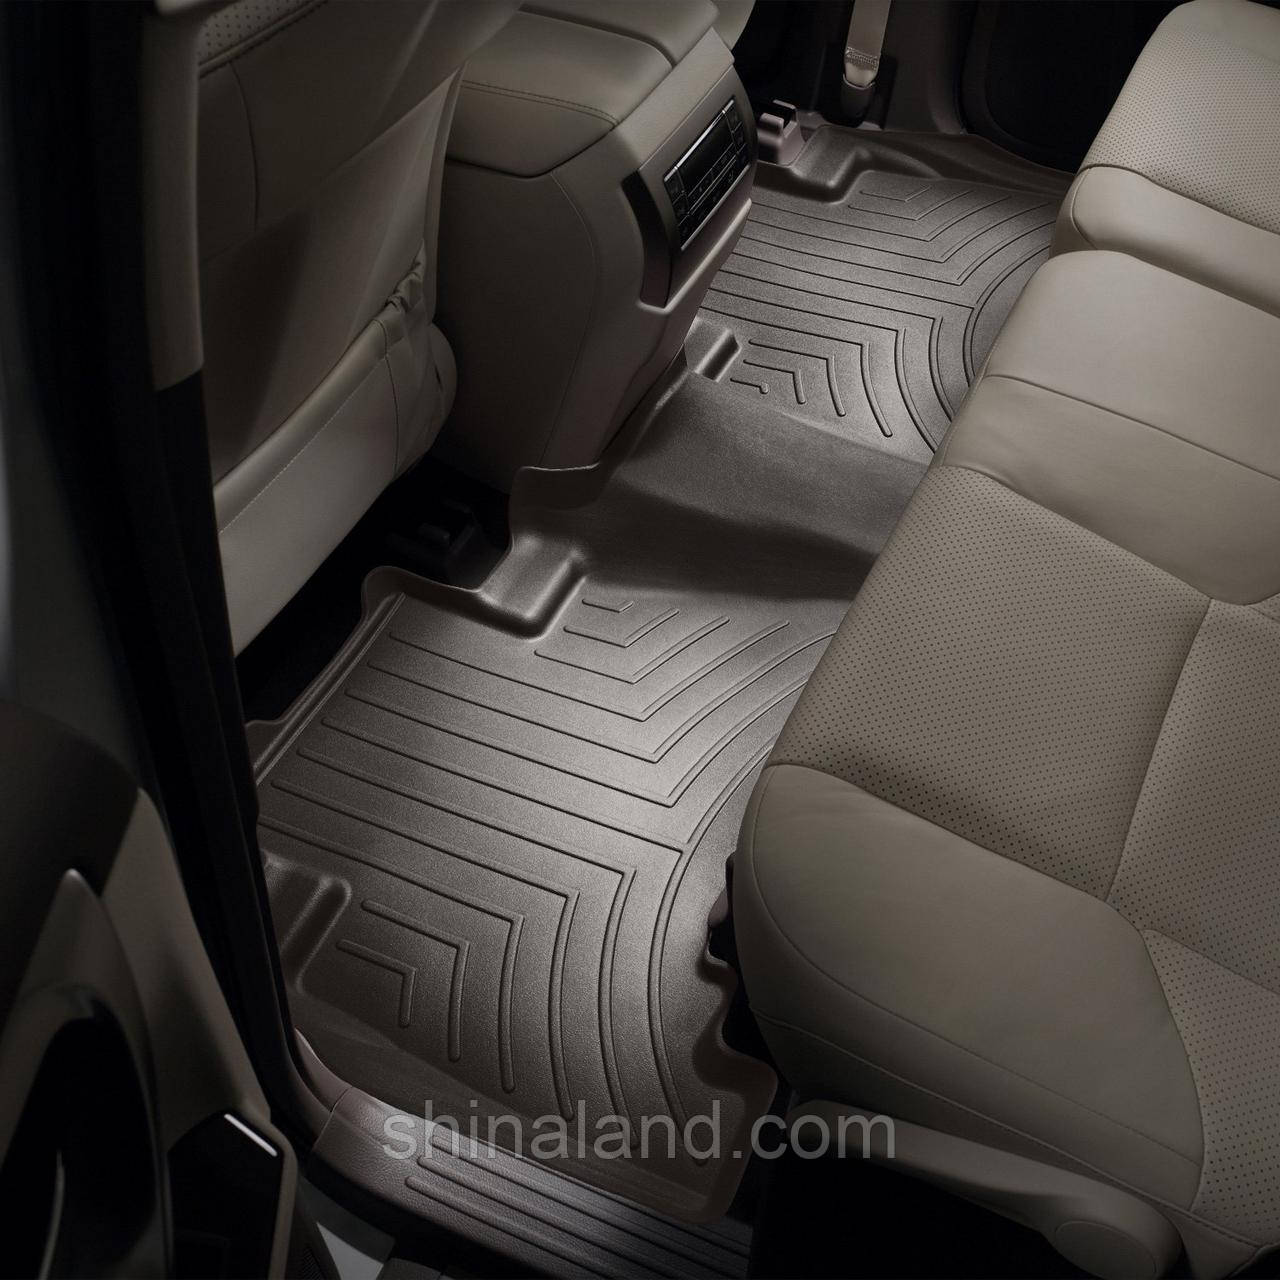 Коврики в салон Toyota Land Cruiser Prado IV (J150) / Lexus GX II 460 (J150) 2009 - 2019 какао, Tri-Extruded (WeatherTech) - второй ряд